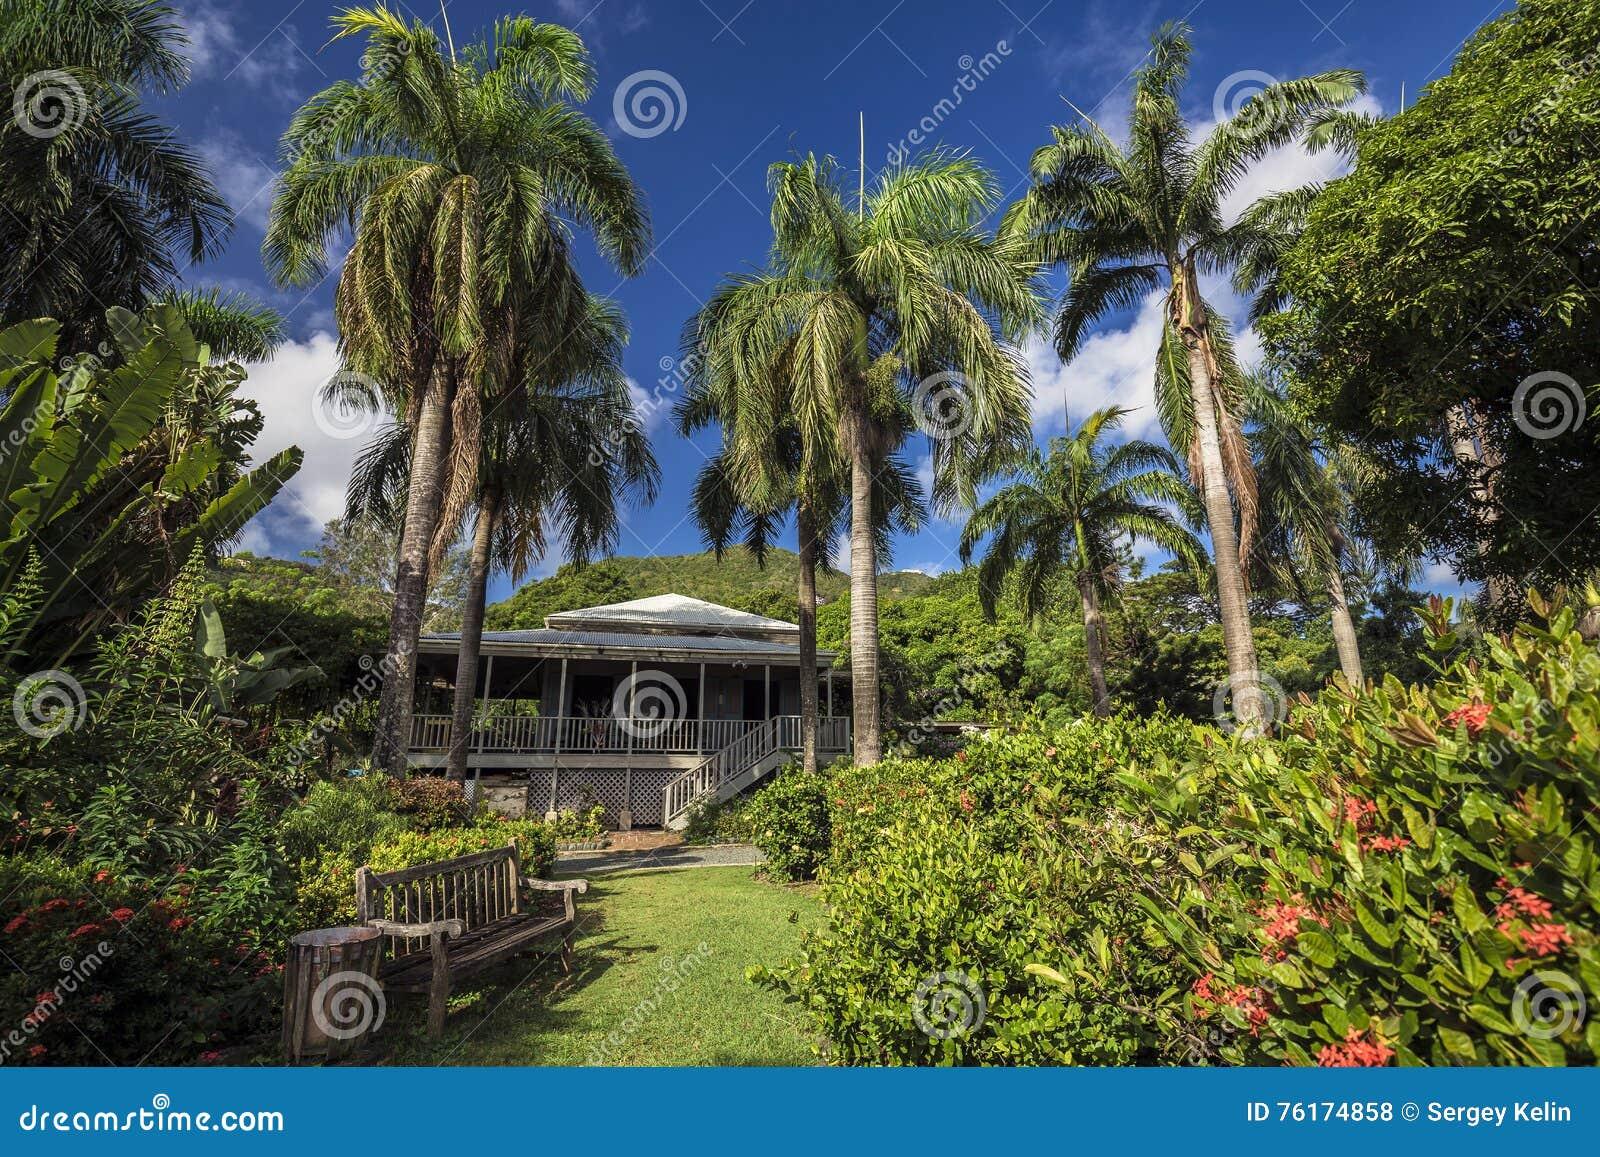 Planter house in botanic garden. Road Town, Tortola